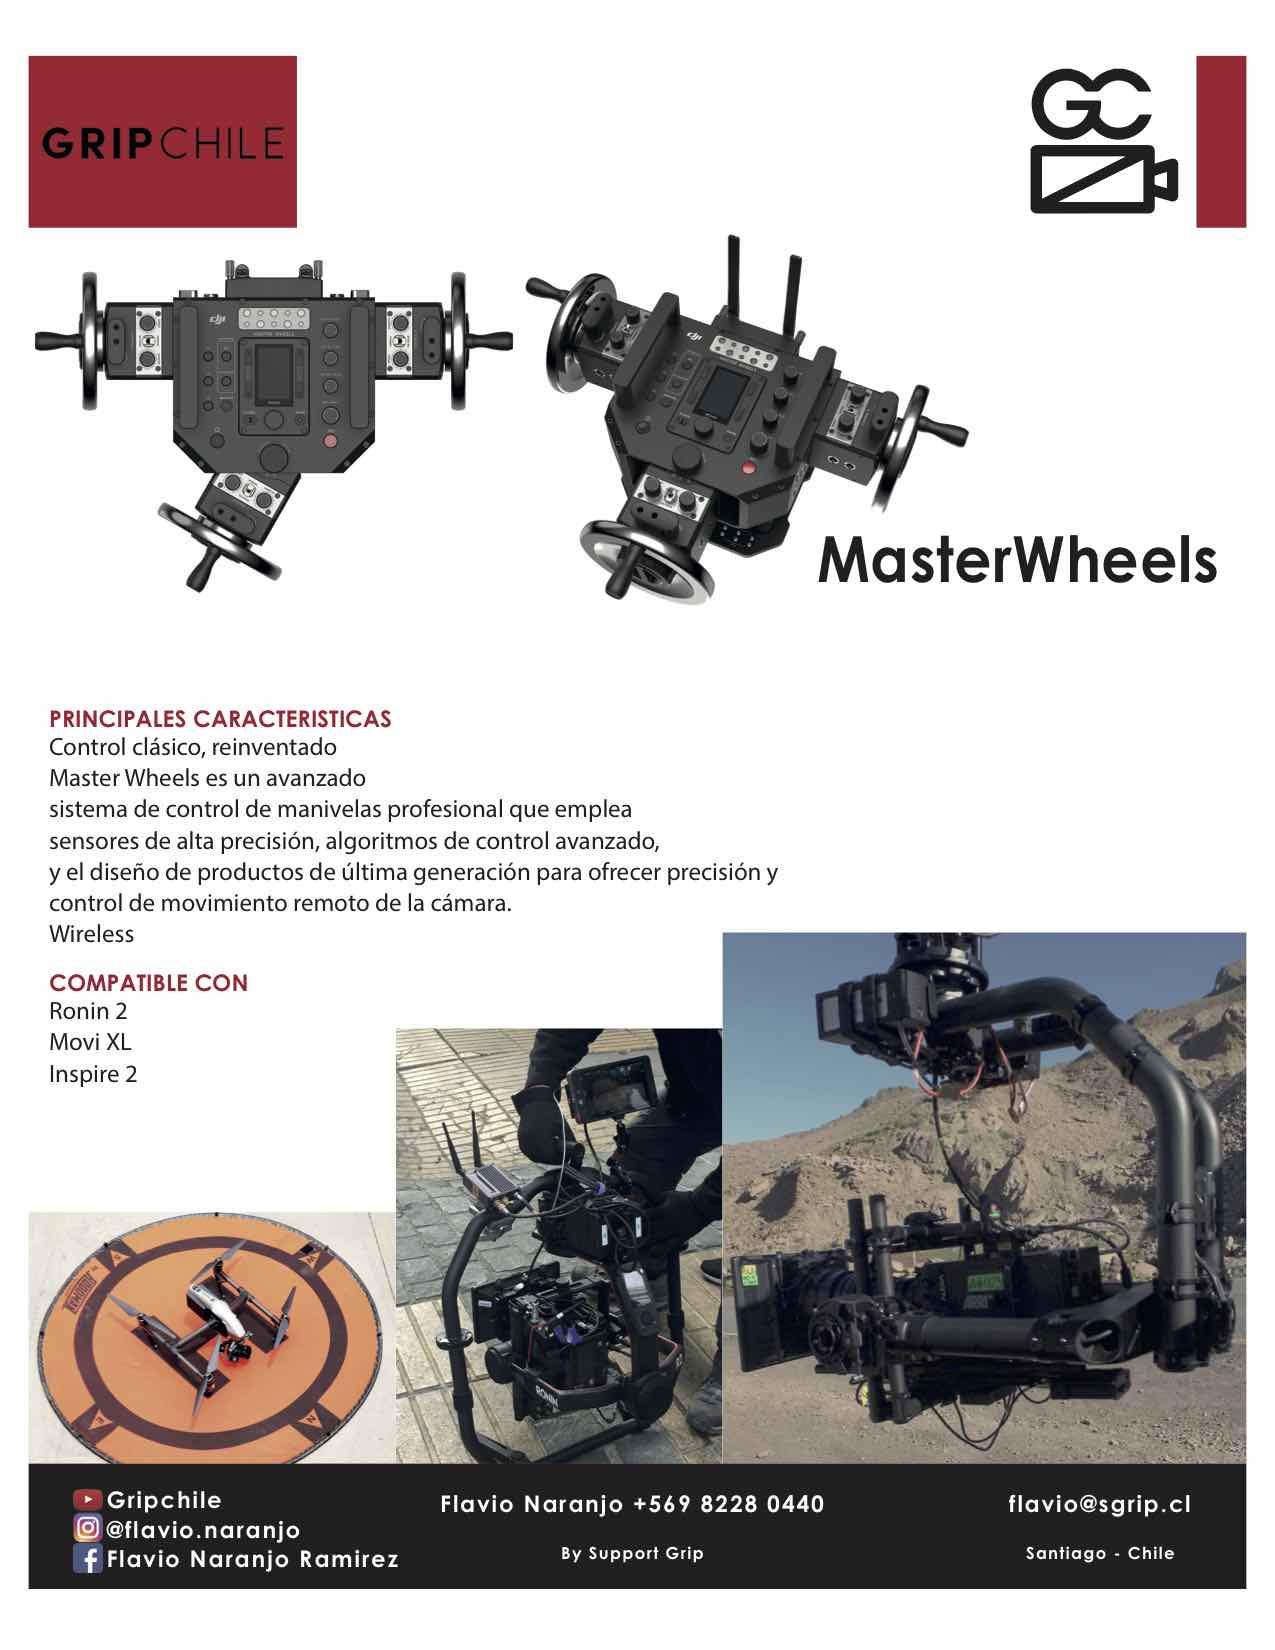 Master_Wheels.jpg